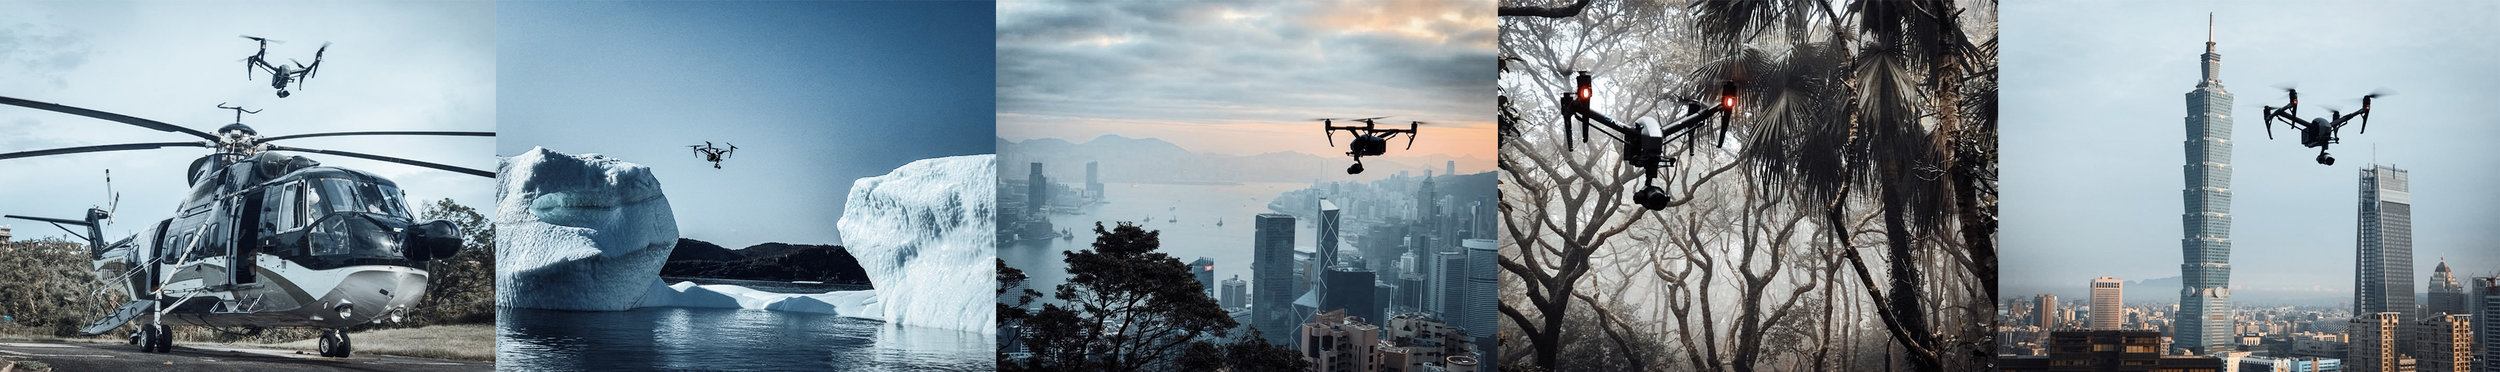 DroneMix.jpg